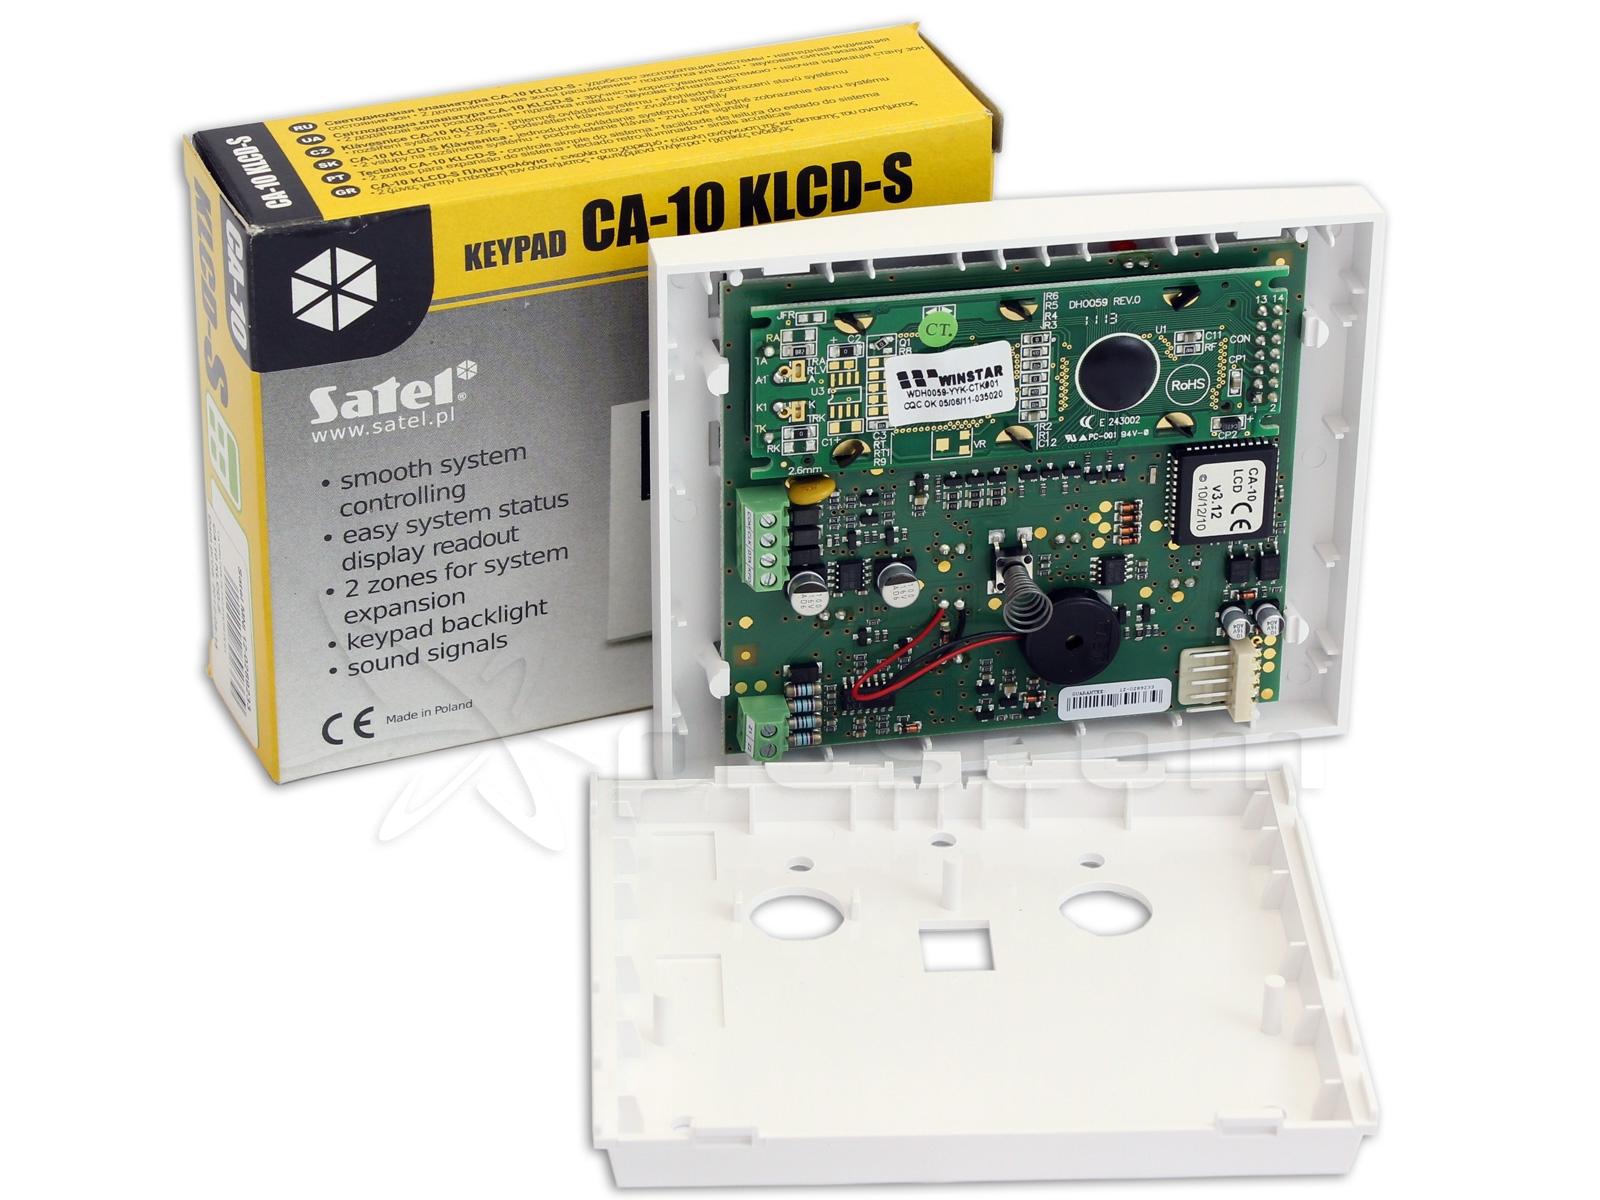 Satel CA-10 KLCD-S LCD Keypad For CA-10 Control Panel